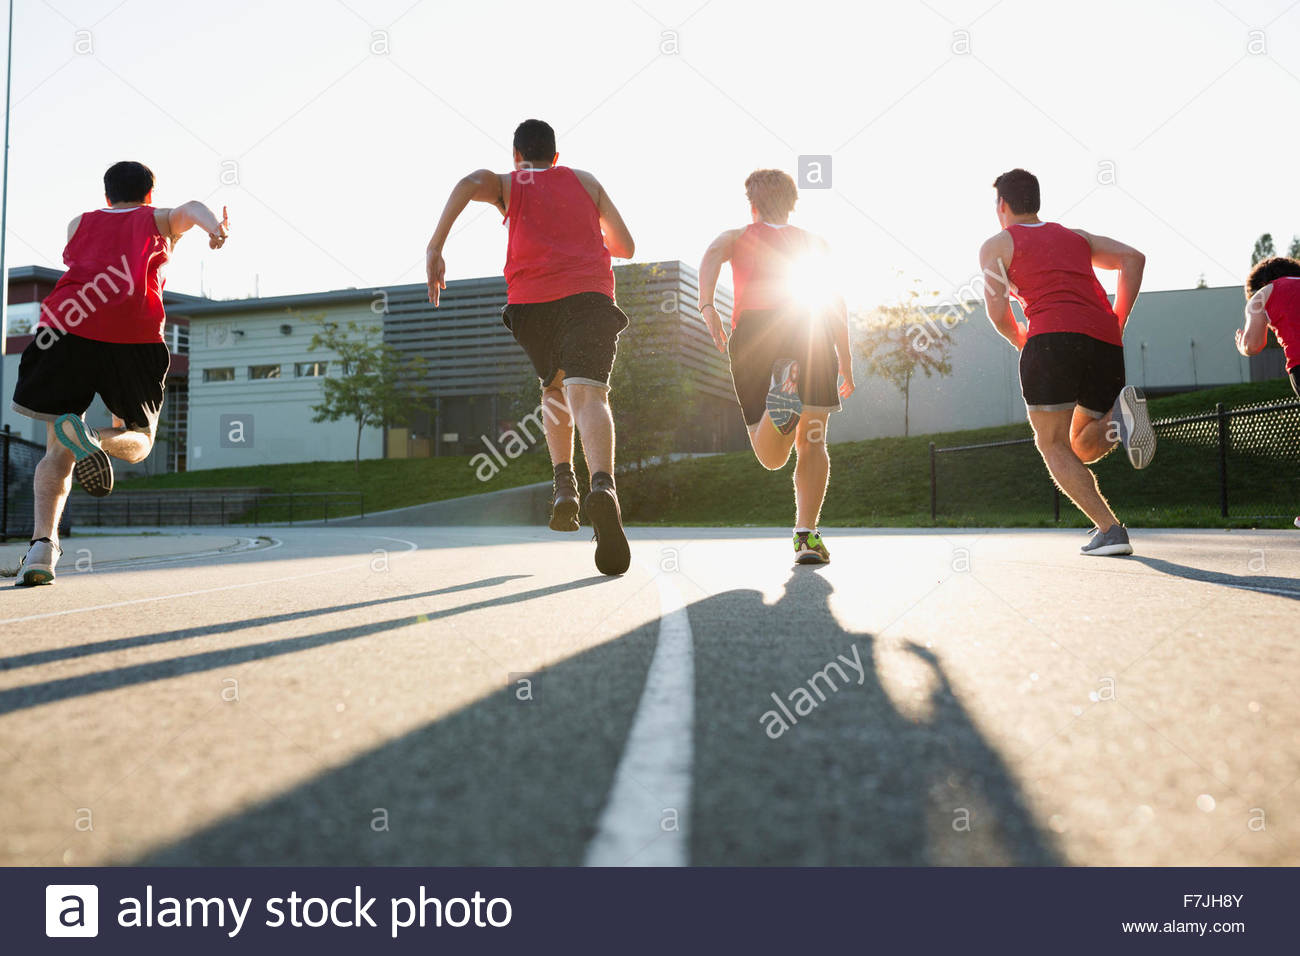 High School Leichtathletik Sportler Laufstrecke Stockbild